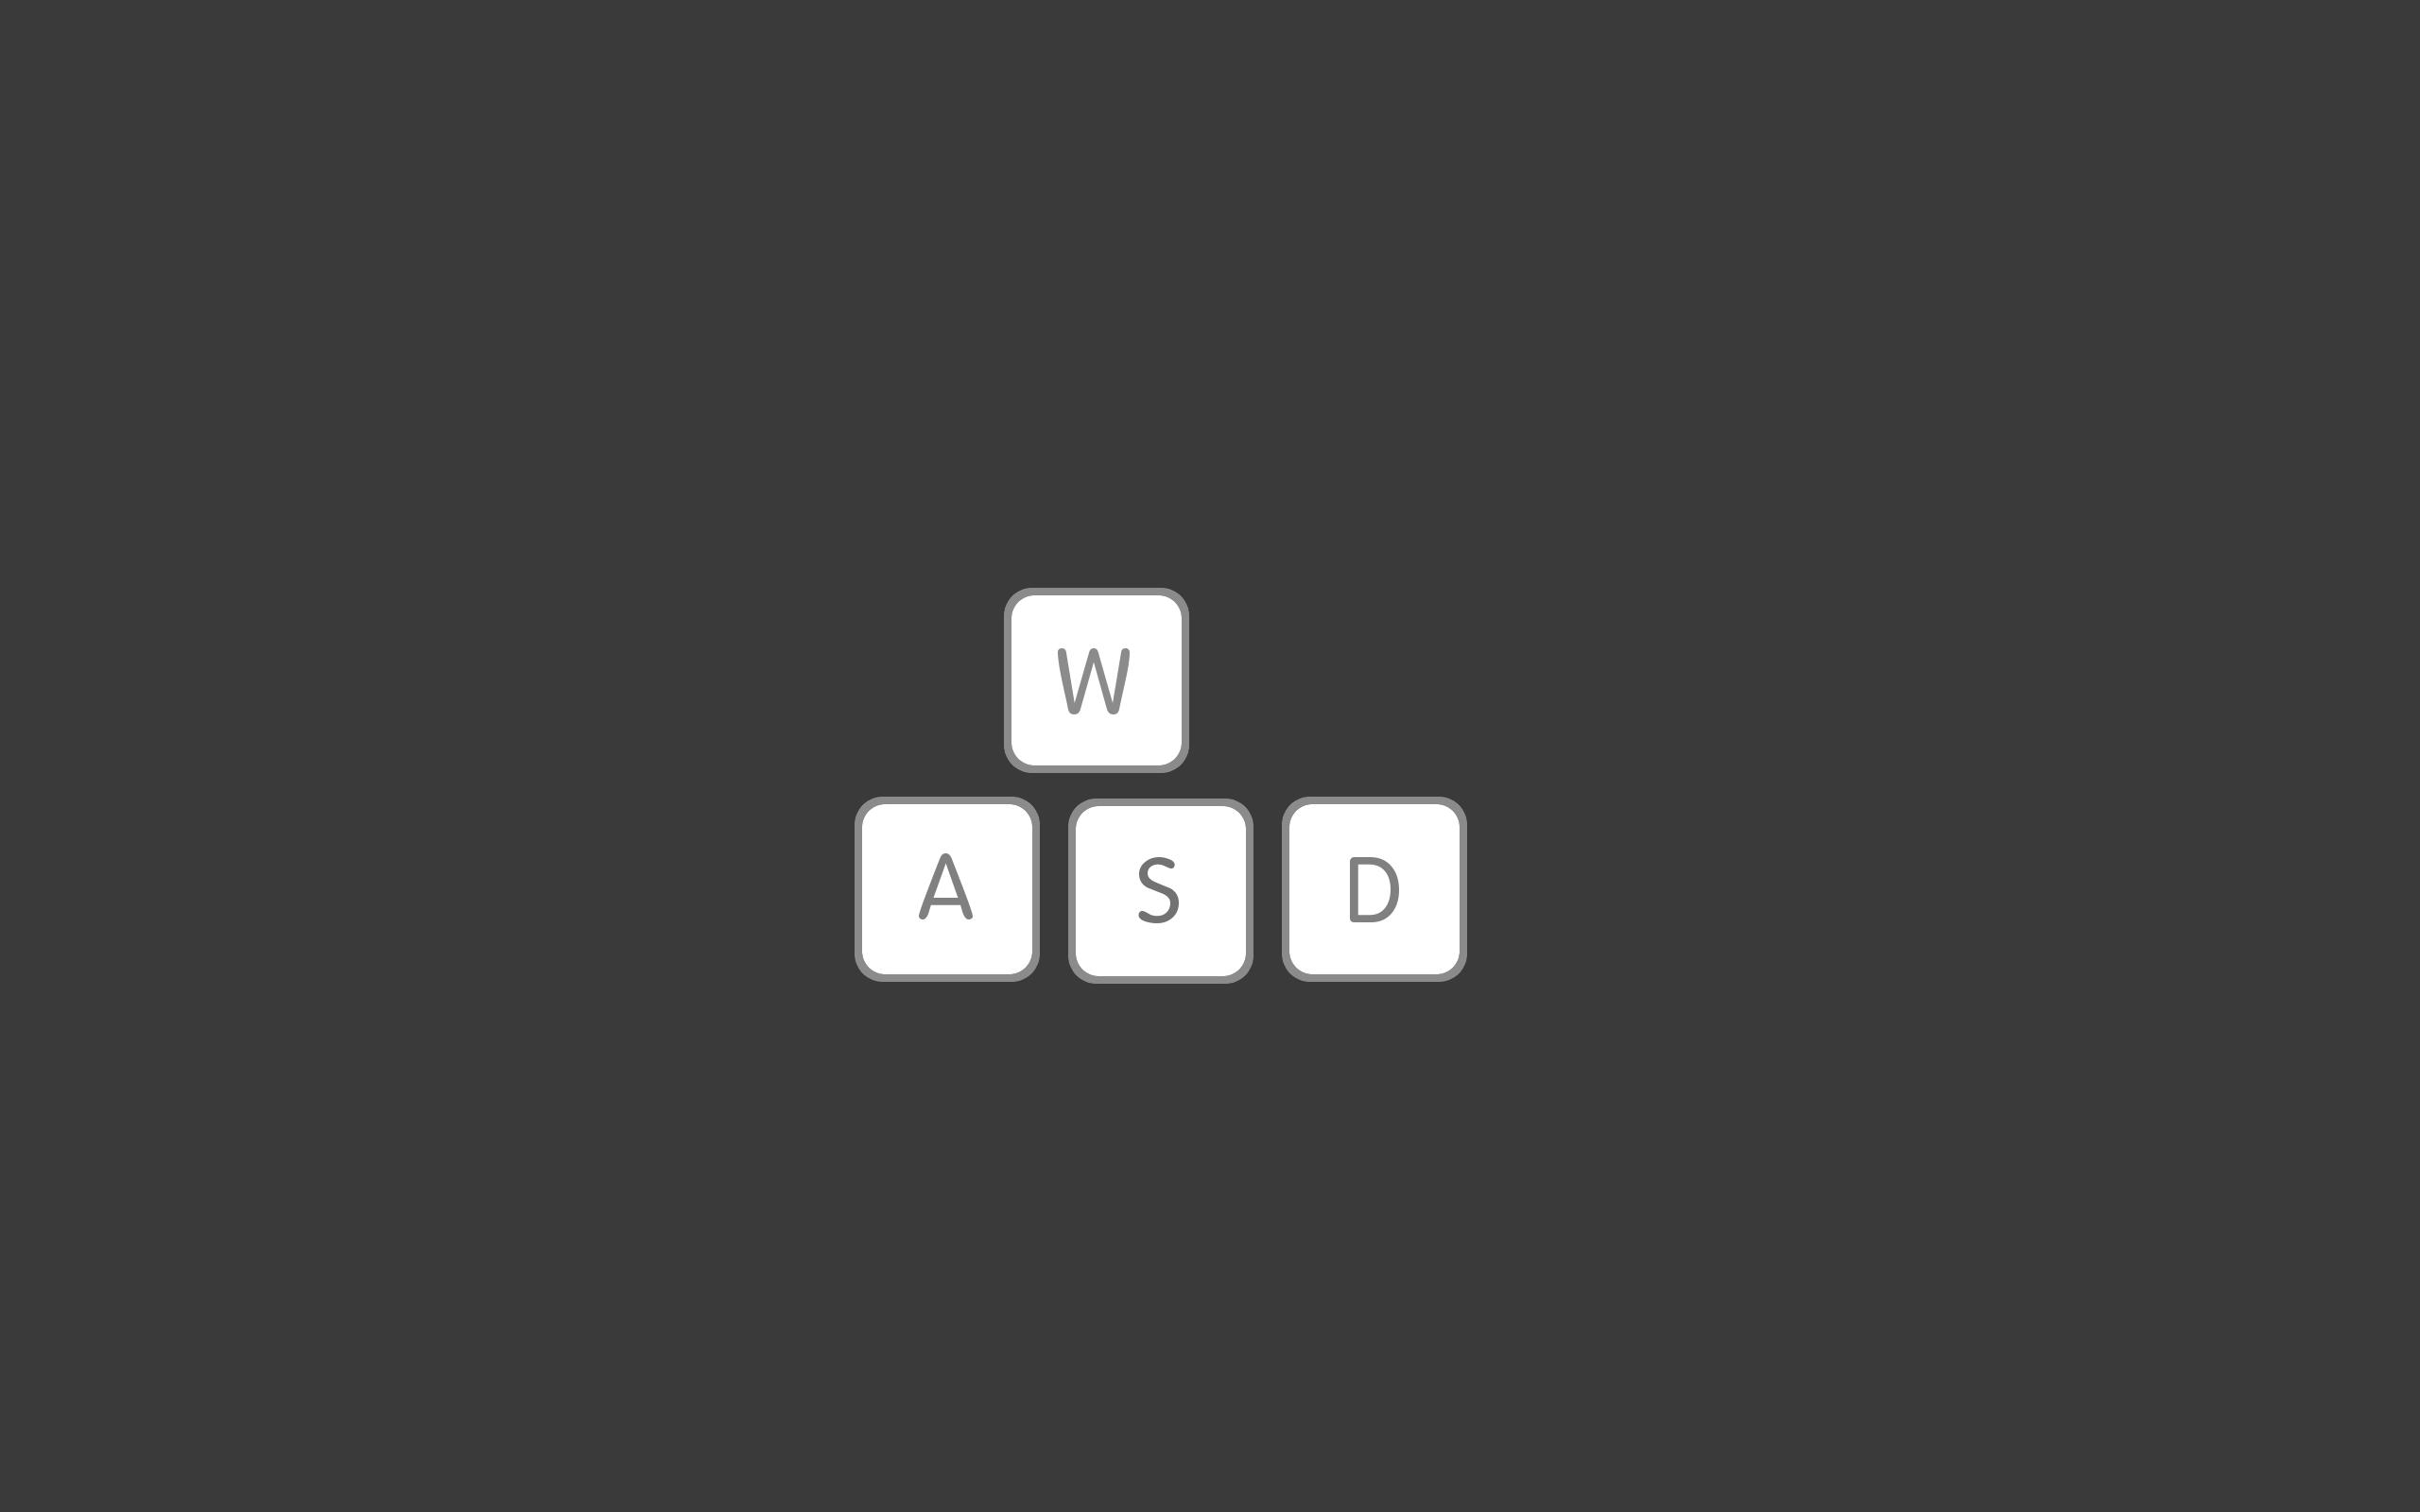 Video games minimalistic mac gray keyboards gaming pc games wallpaper 2560x1600